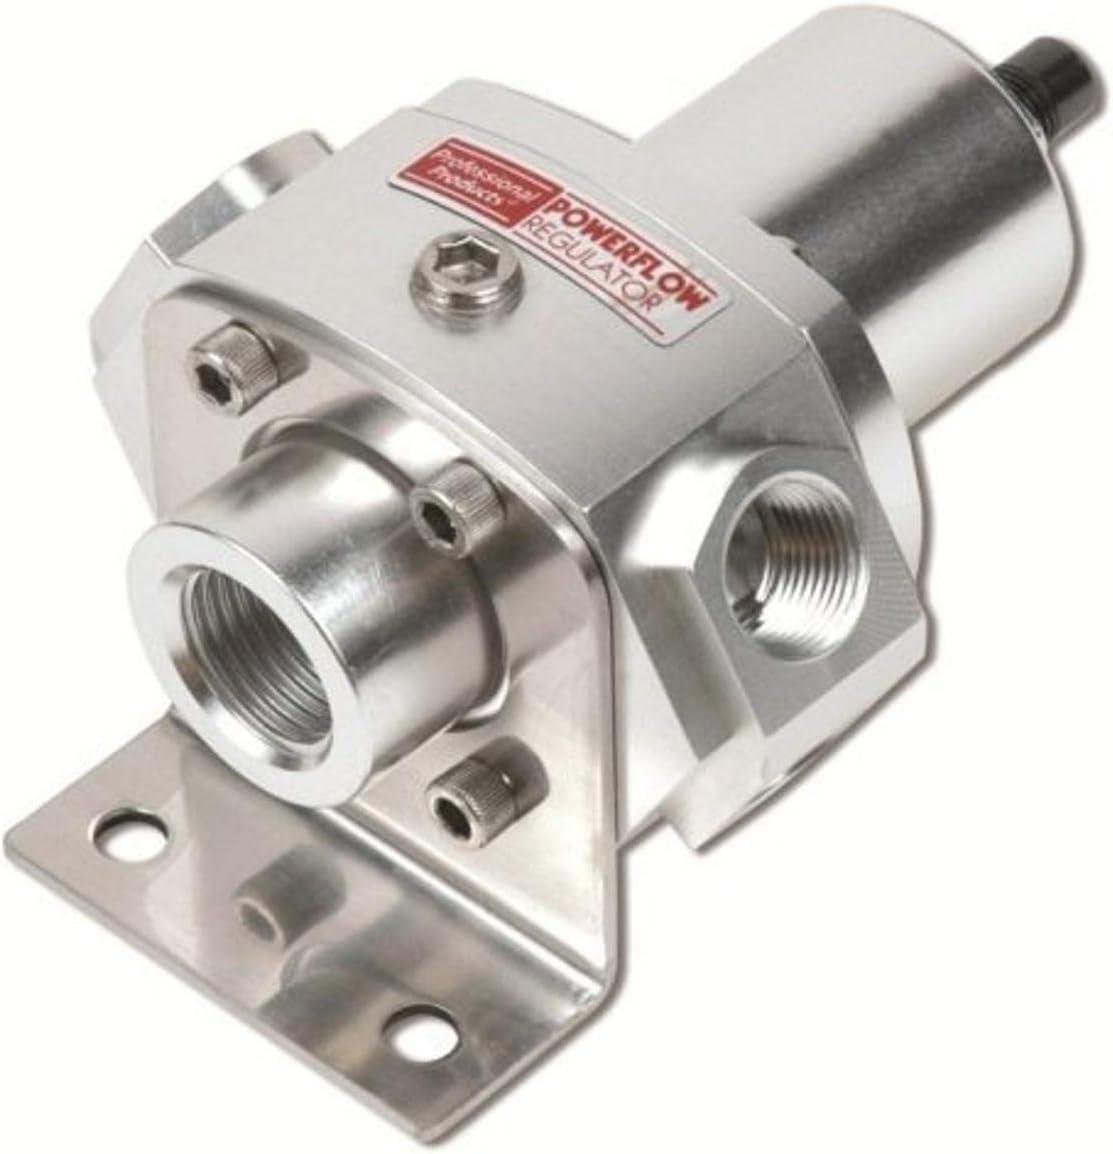 Professional Products 10672 Blue 4-Port EFI Fuel Max 70% OFF Superlatite Regulator